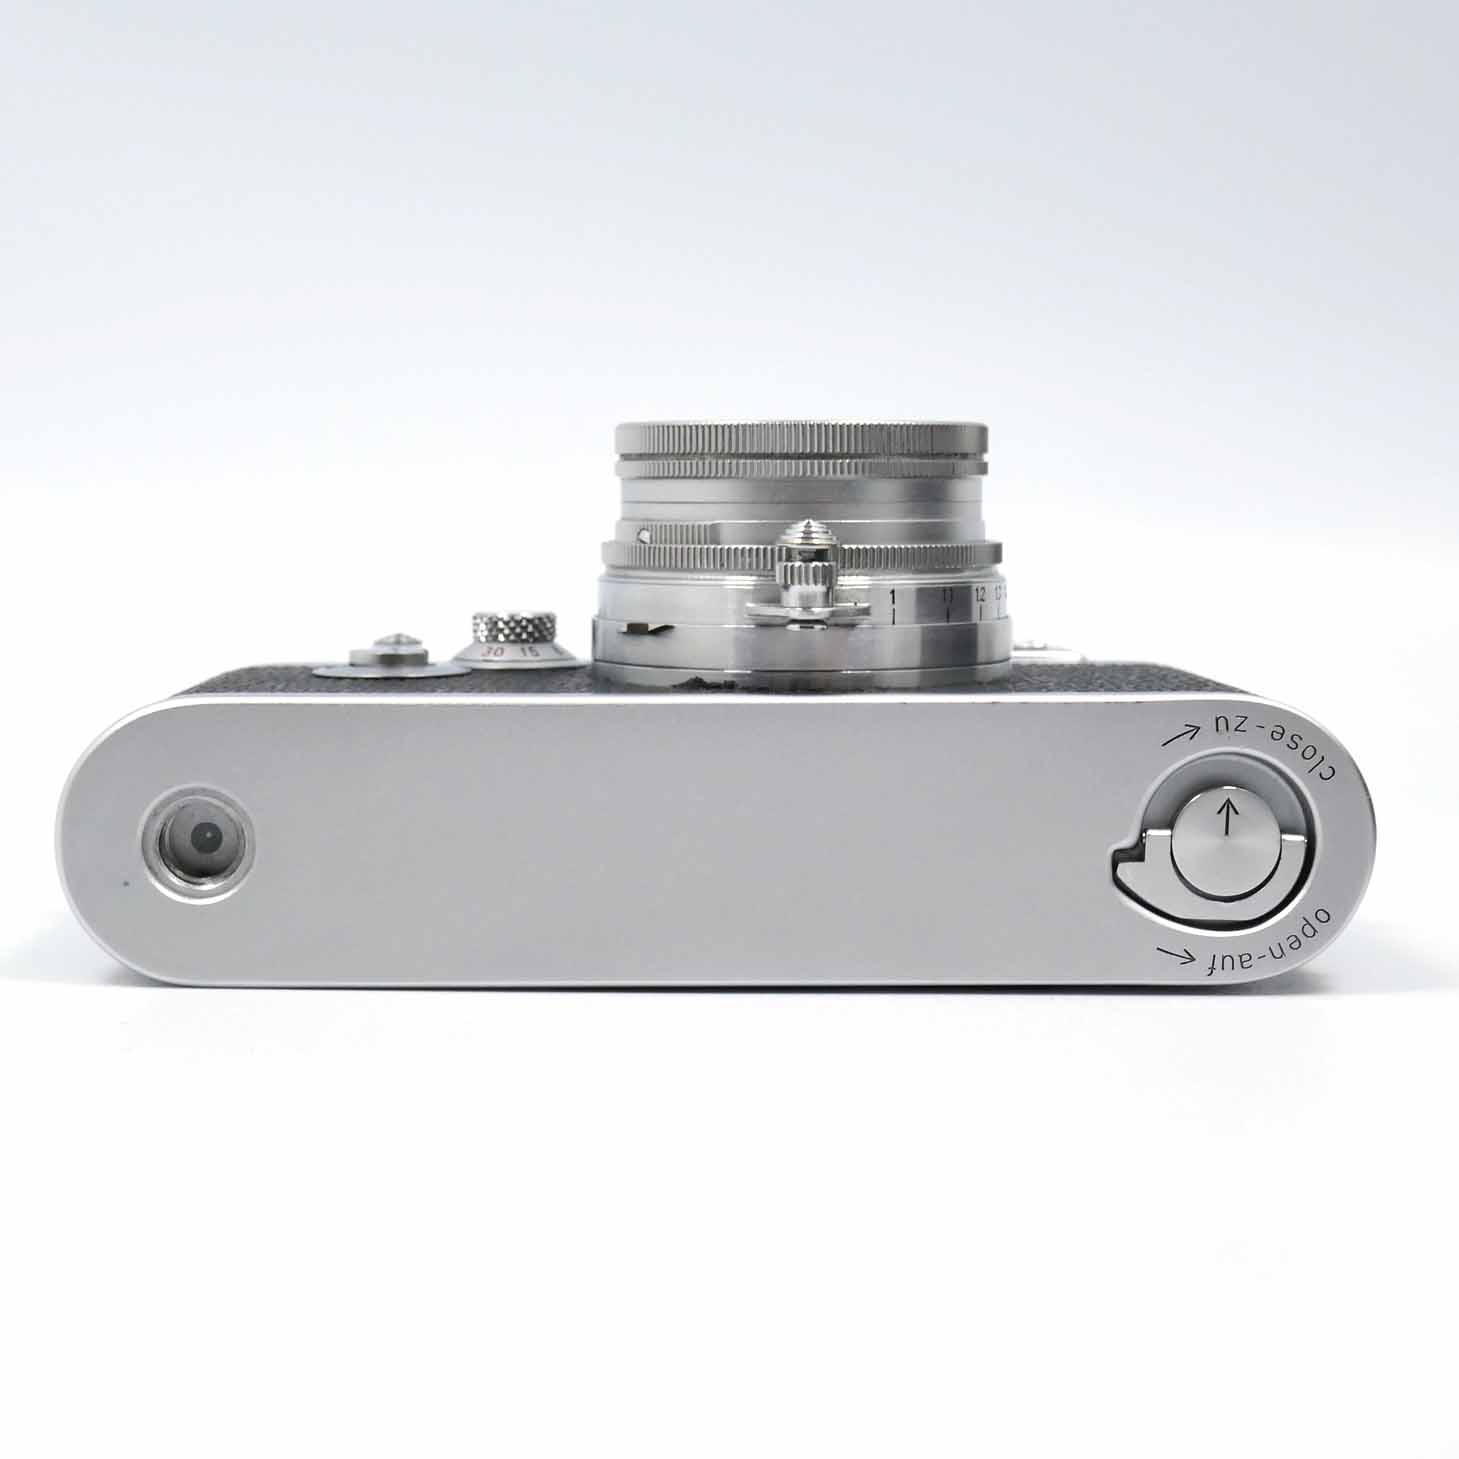 clean-cameras-Leica-IIIg+Summicron-2.0-5cm17